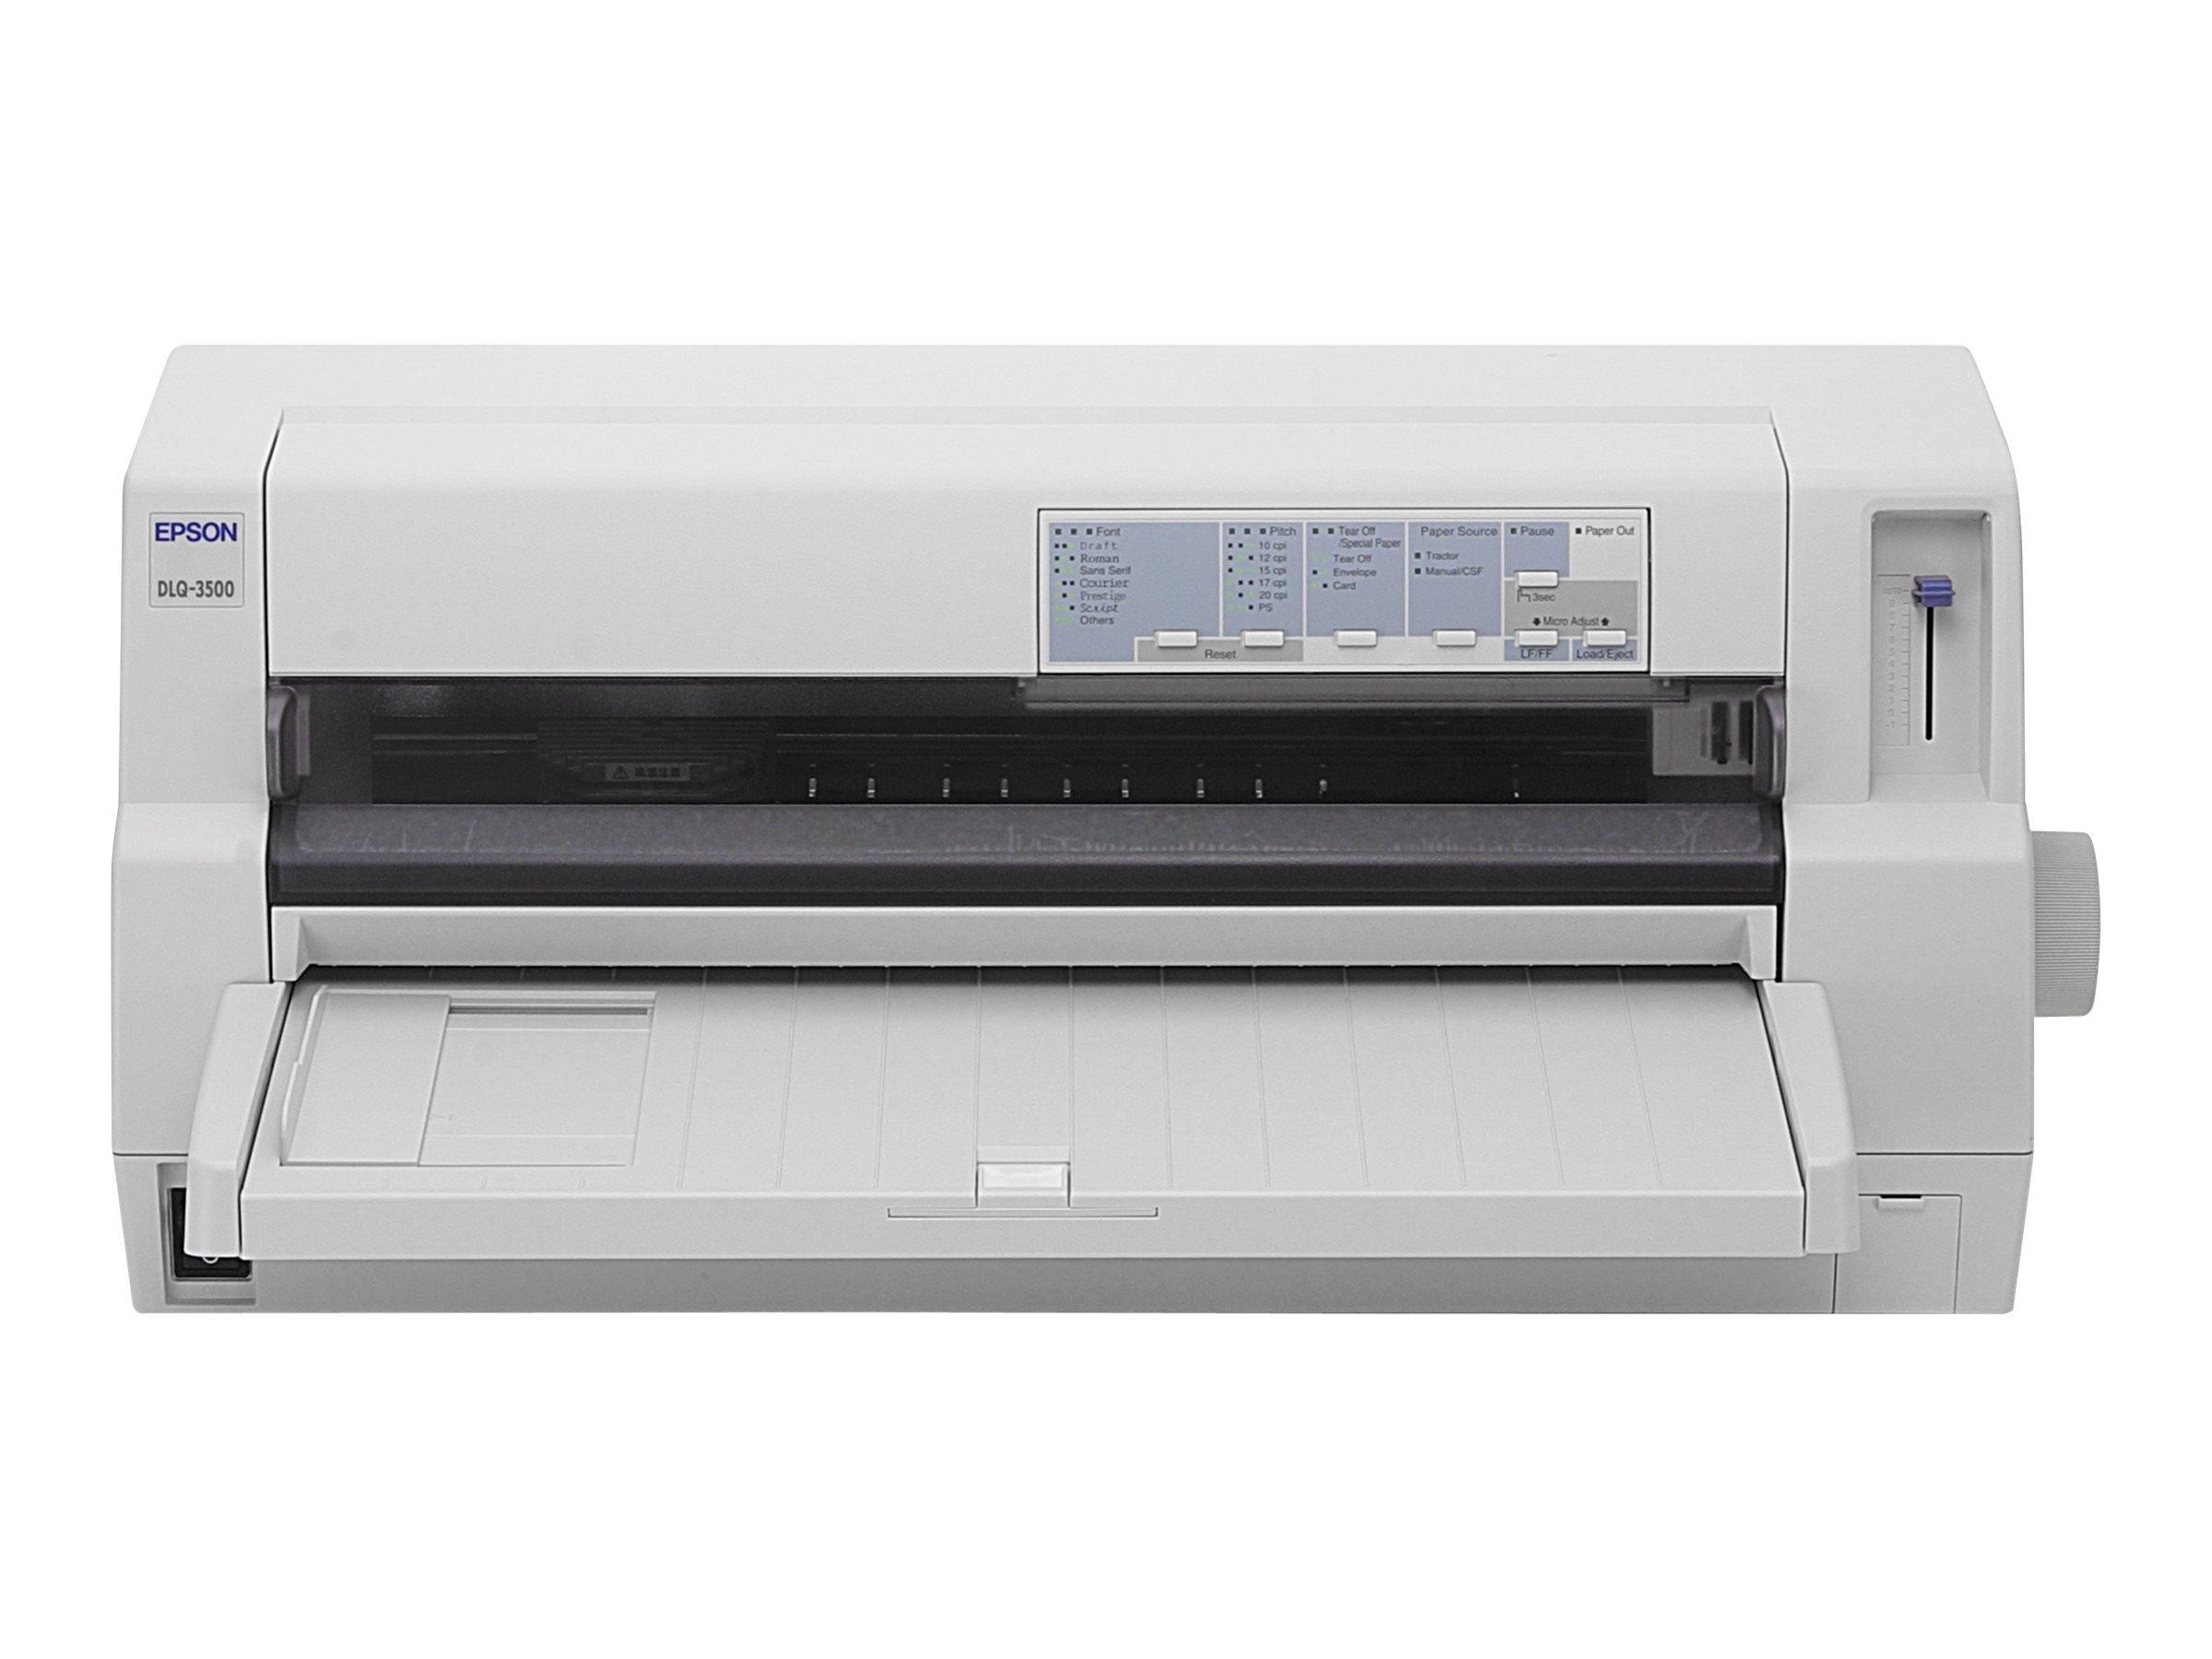 Epson DLQ 3500 - Drucker - Farbe - Punktmatrix